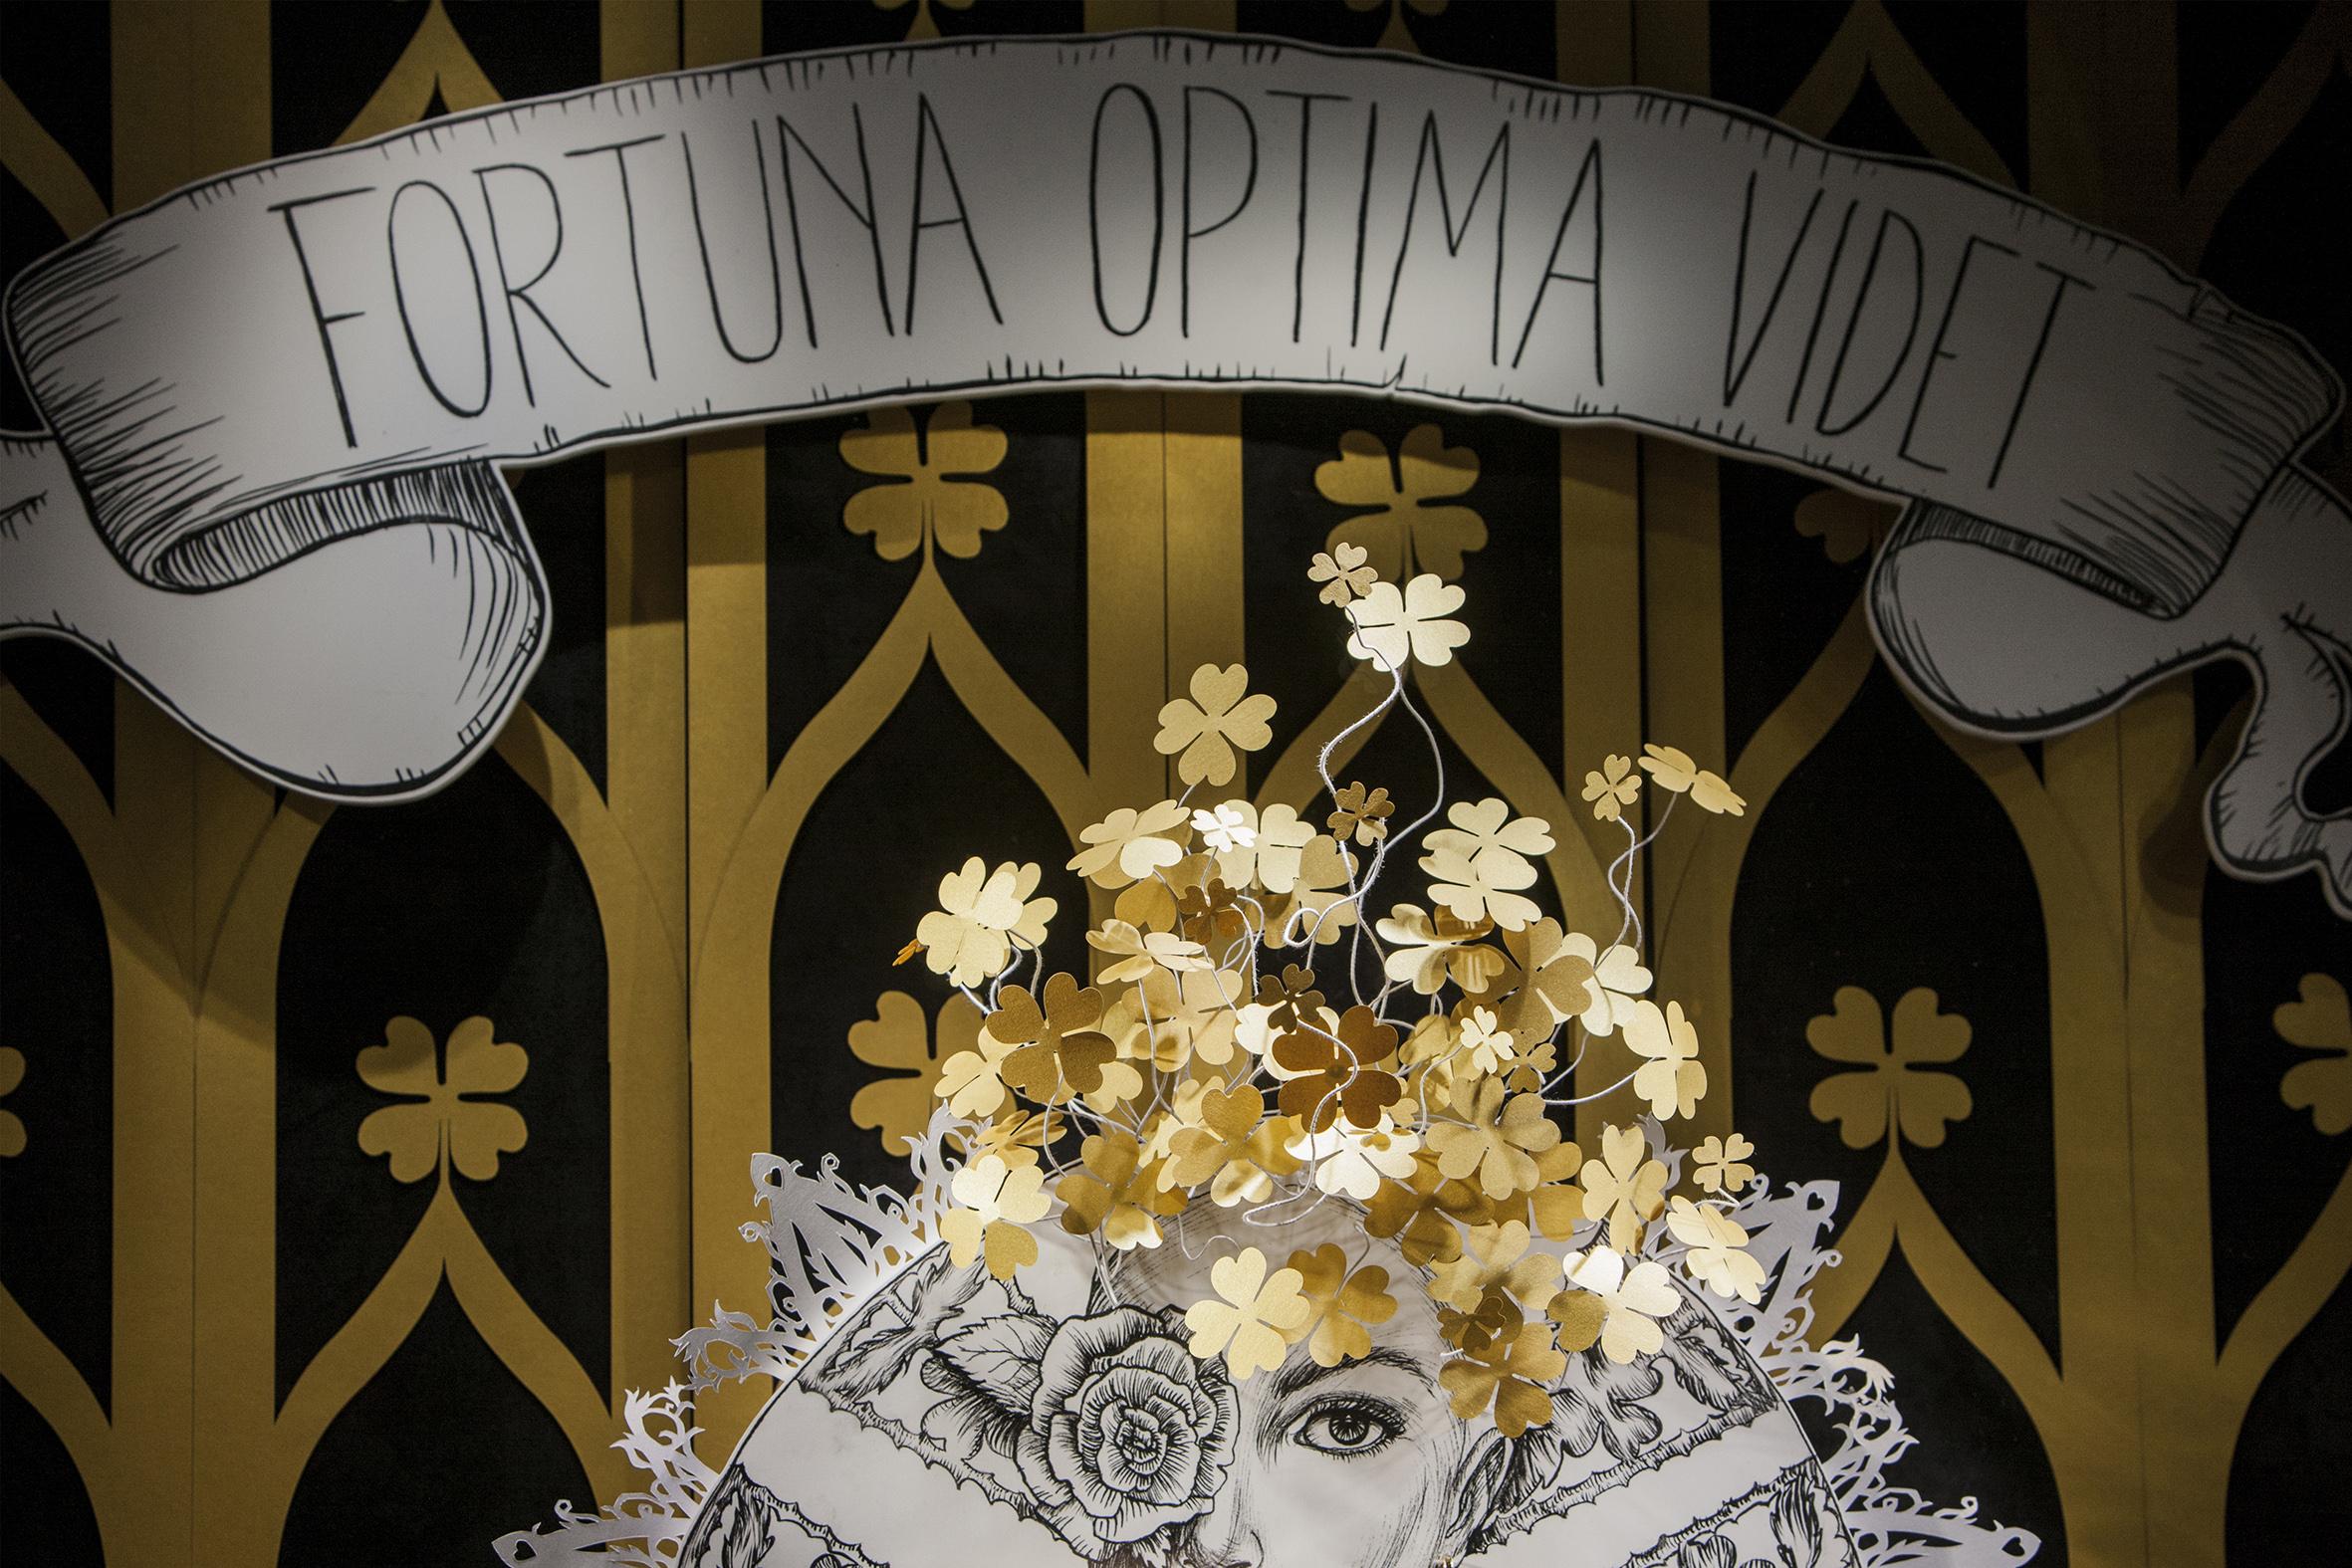 Fortuna-Optima_videt_elena_borghi_papercraft_Sicis